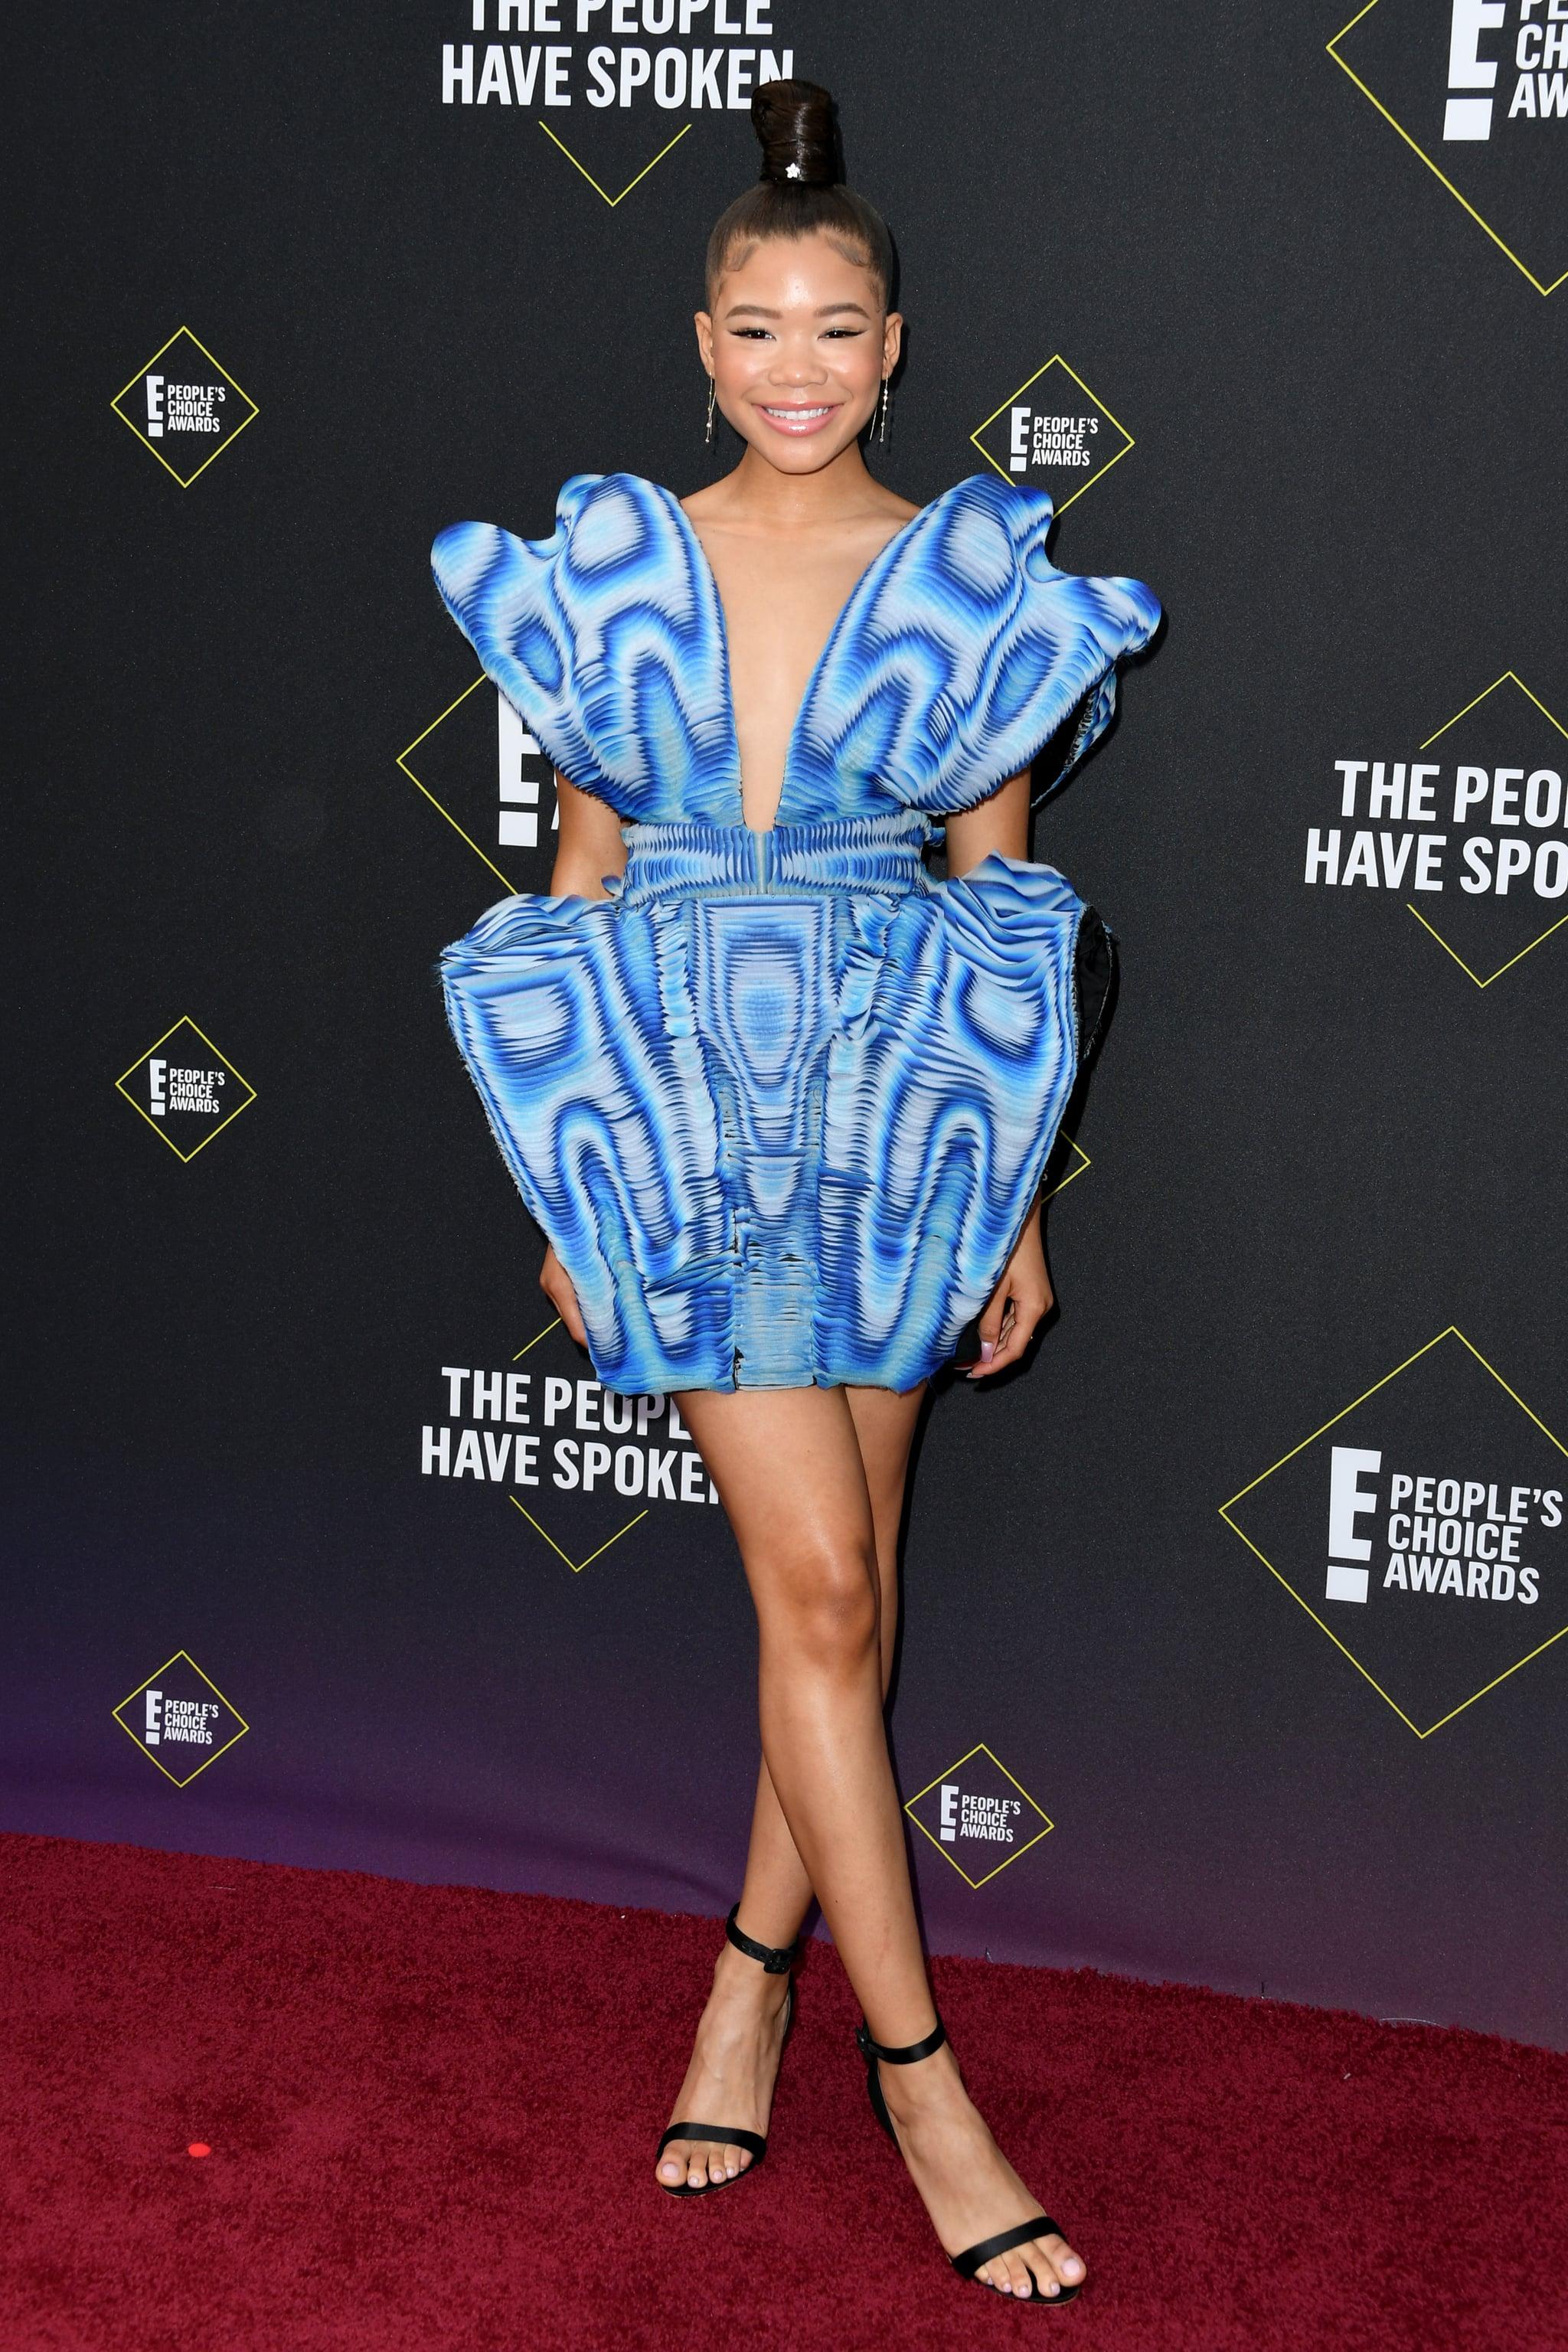 SANTA MONICA, CALIFORNIA - NOVEMBER 10: Storm Reid attends the 2019 E! People's Choice Awards at Barker Hangar on November 10, 2019 in Santa Monica, California. (Photo by Jon Kopaloff/FilmMagic)